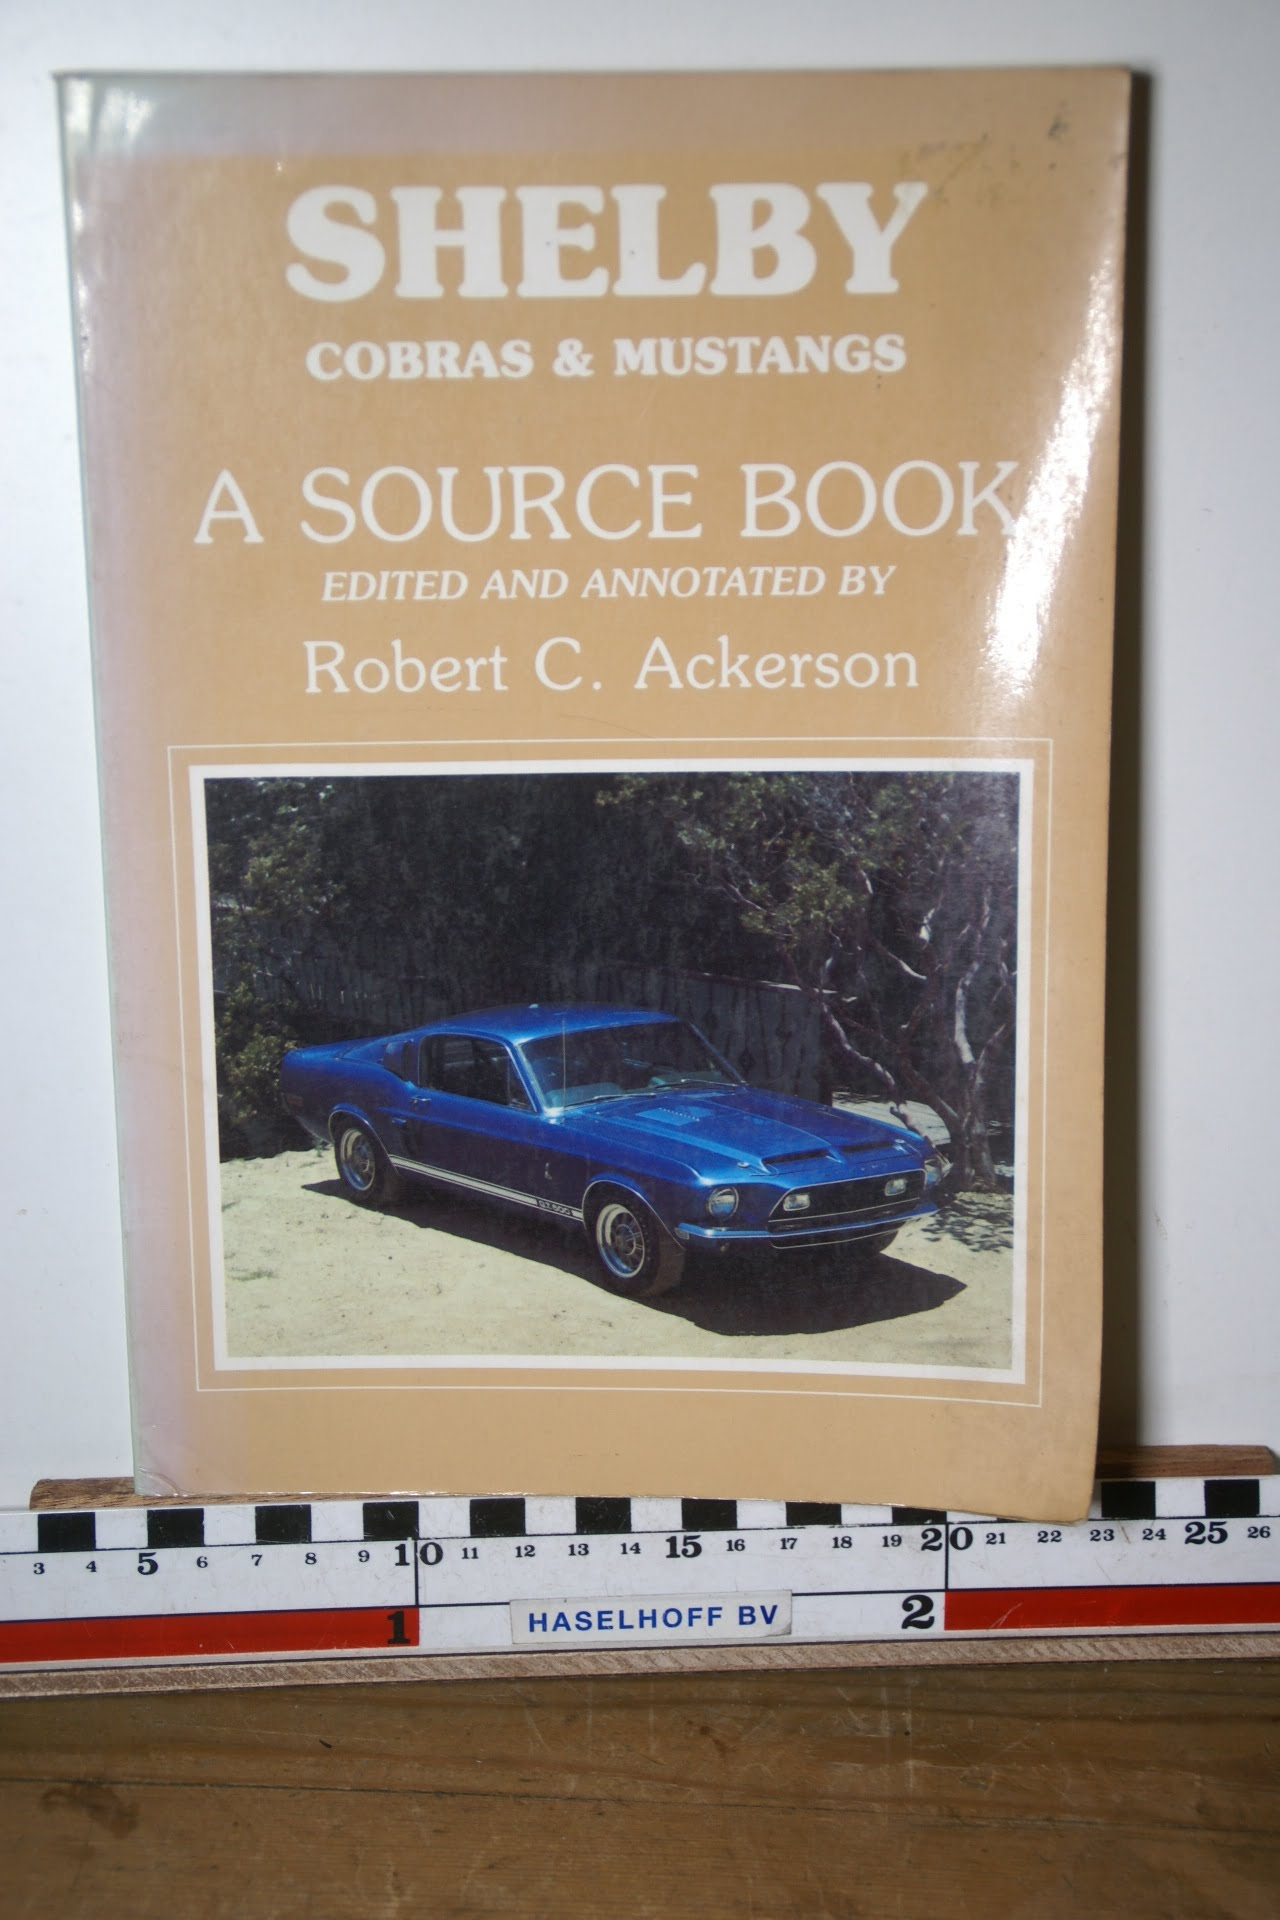 Robert Ackerson Shelby Cobras & Mustangs 180205-3698-0